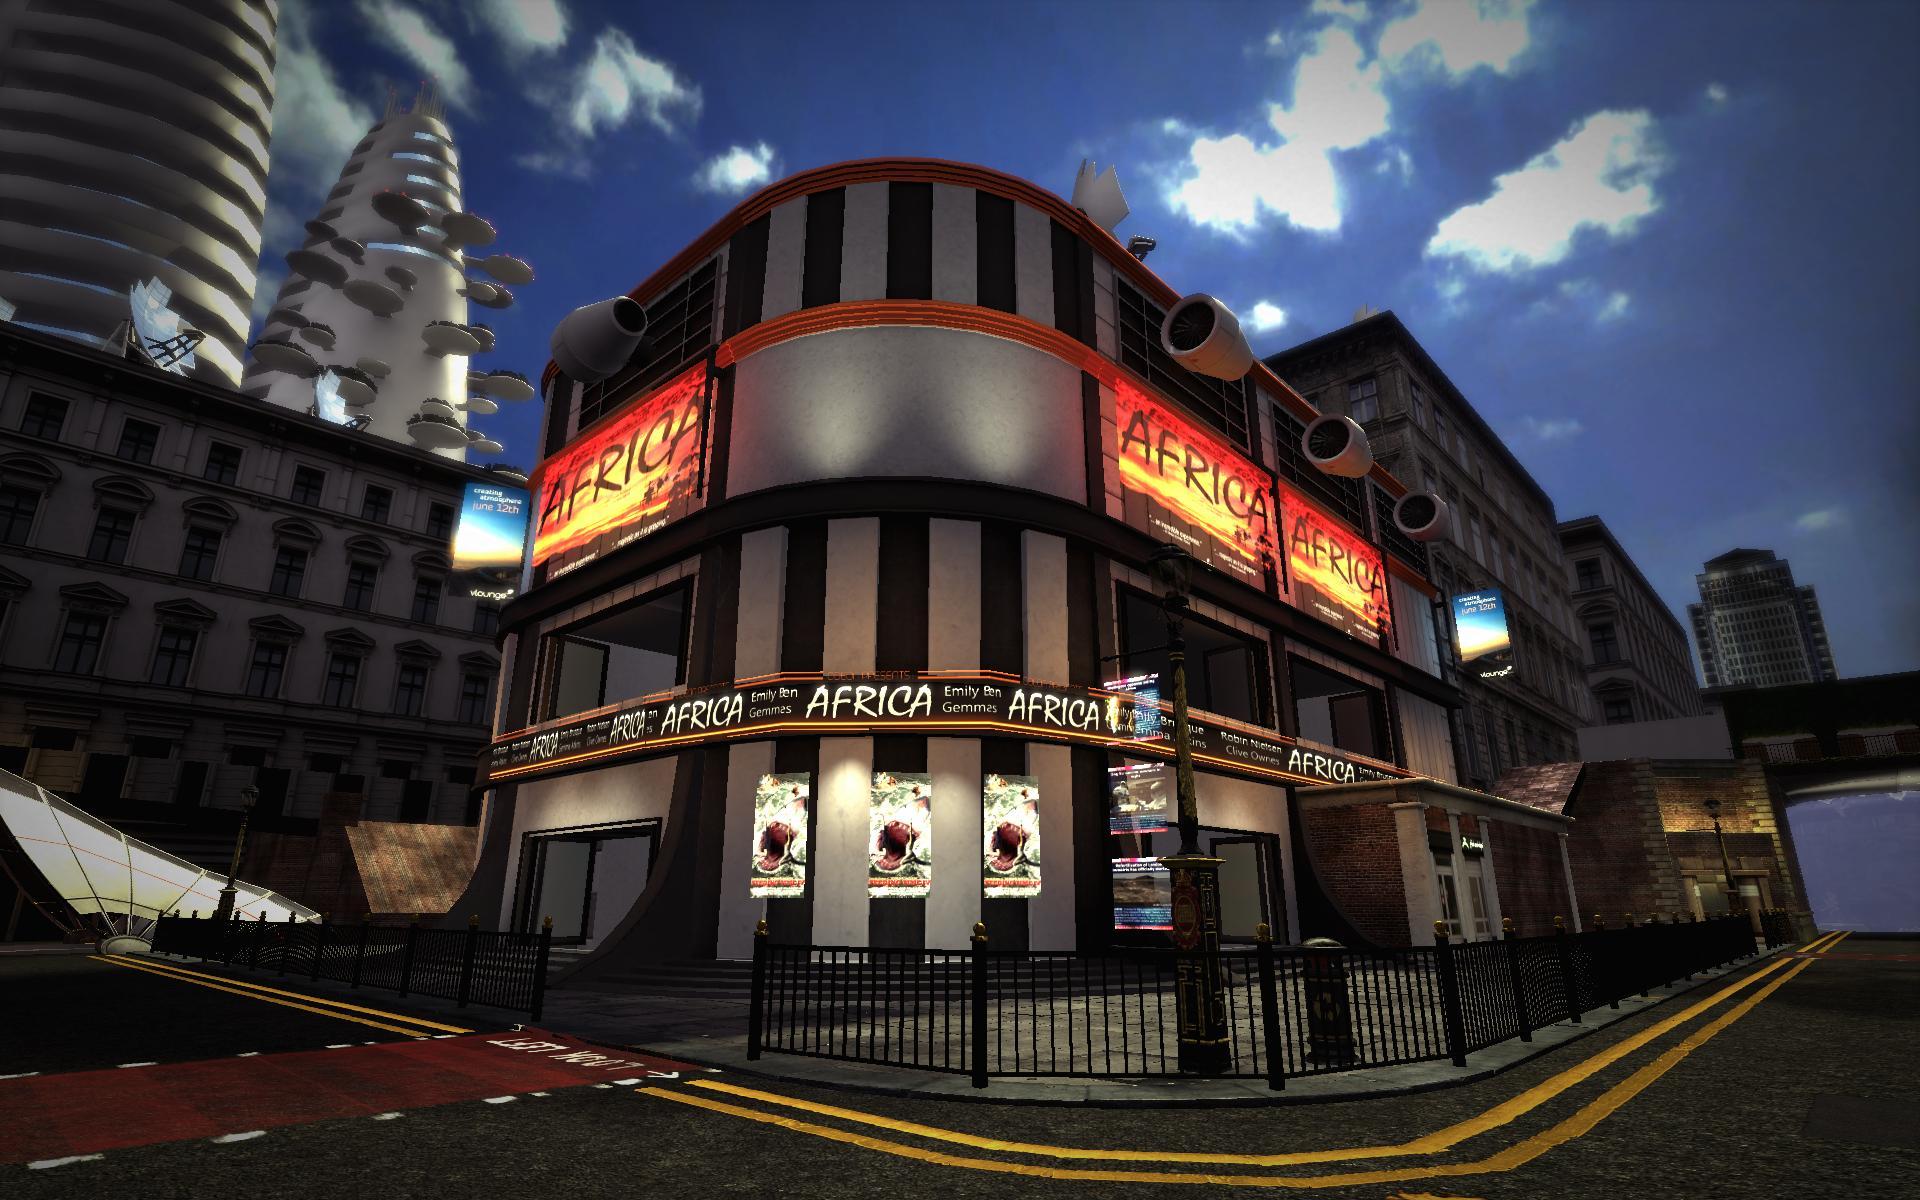 Future London: The Cinema